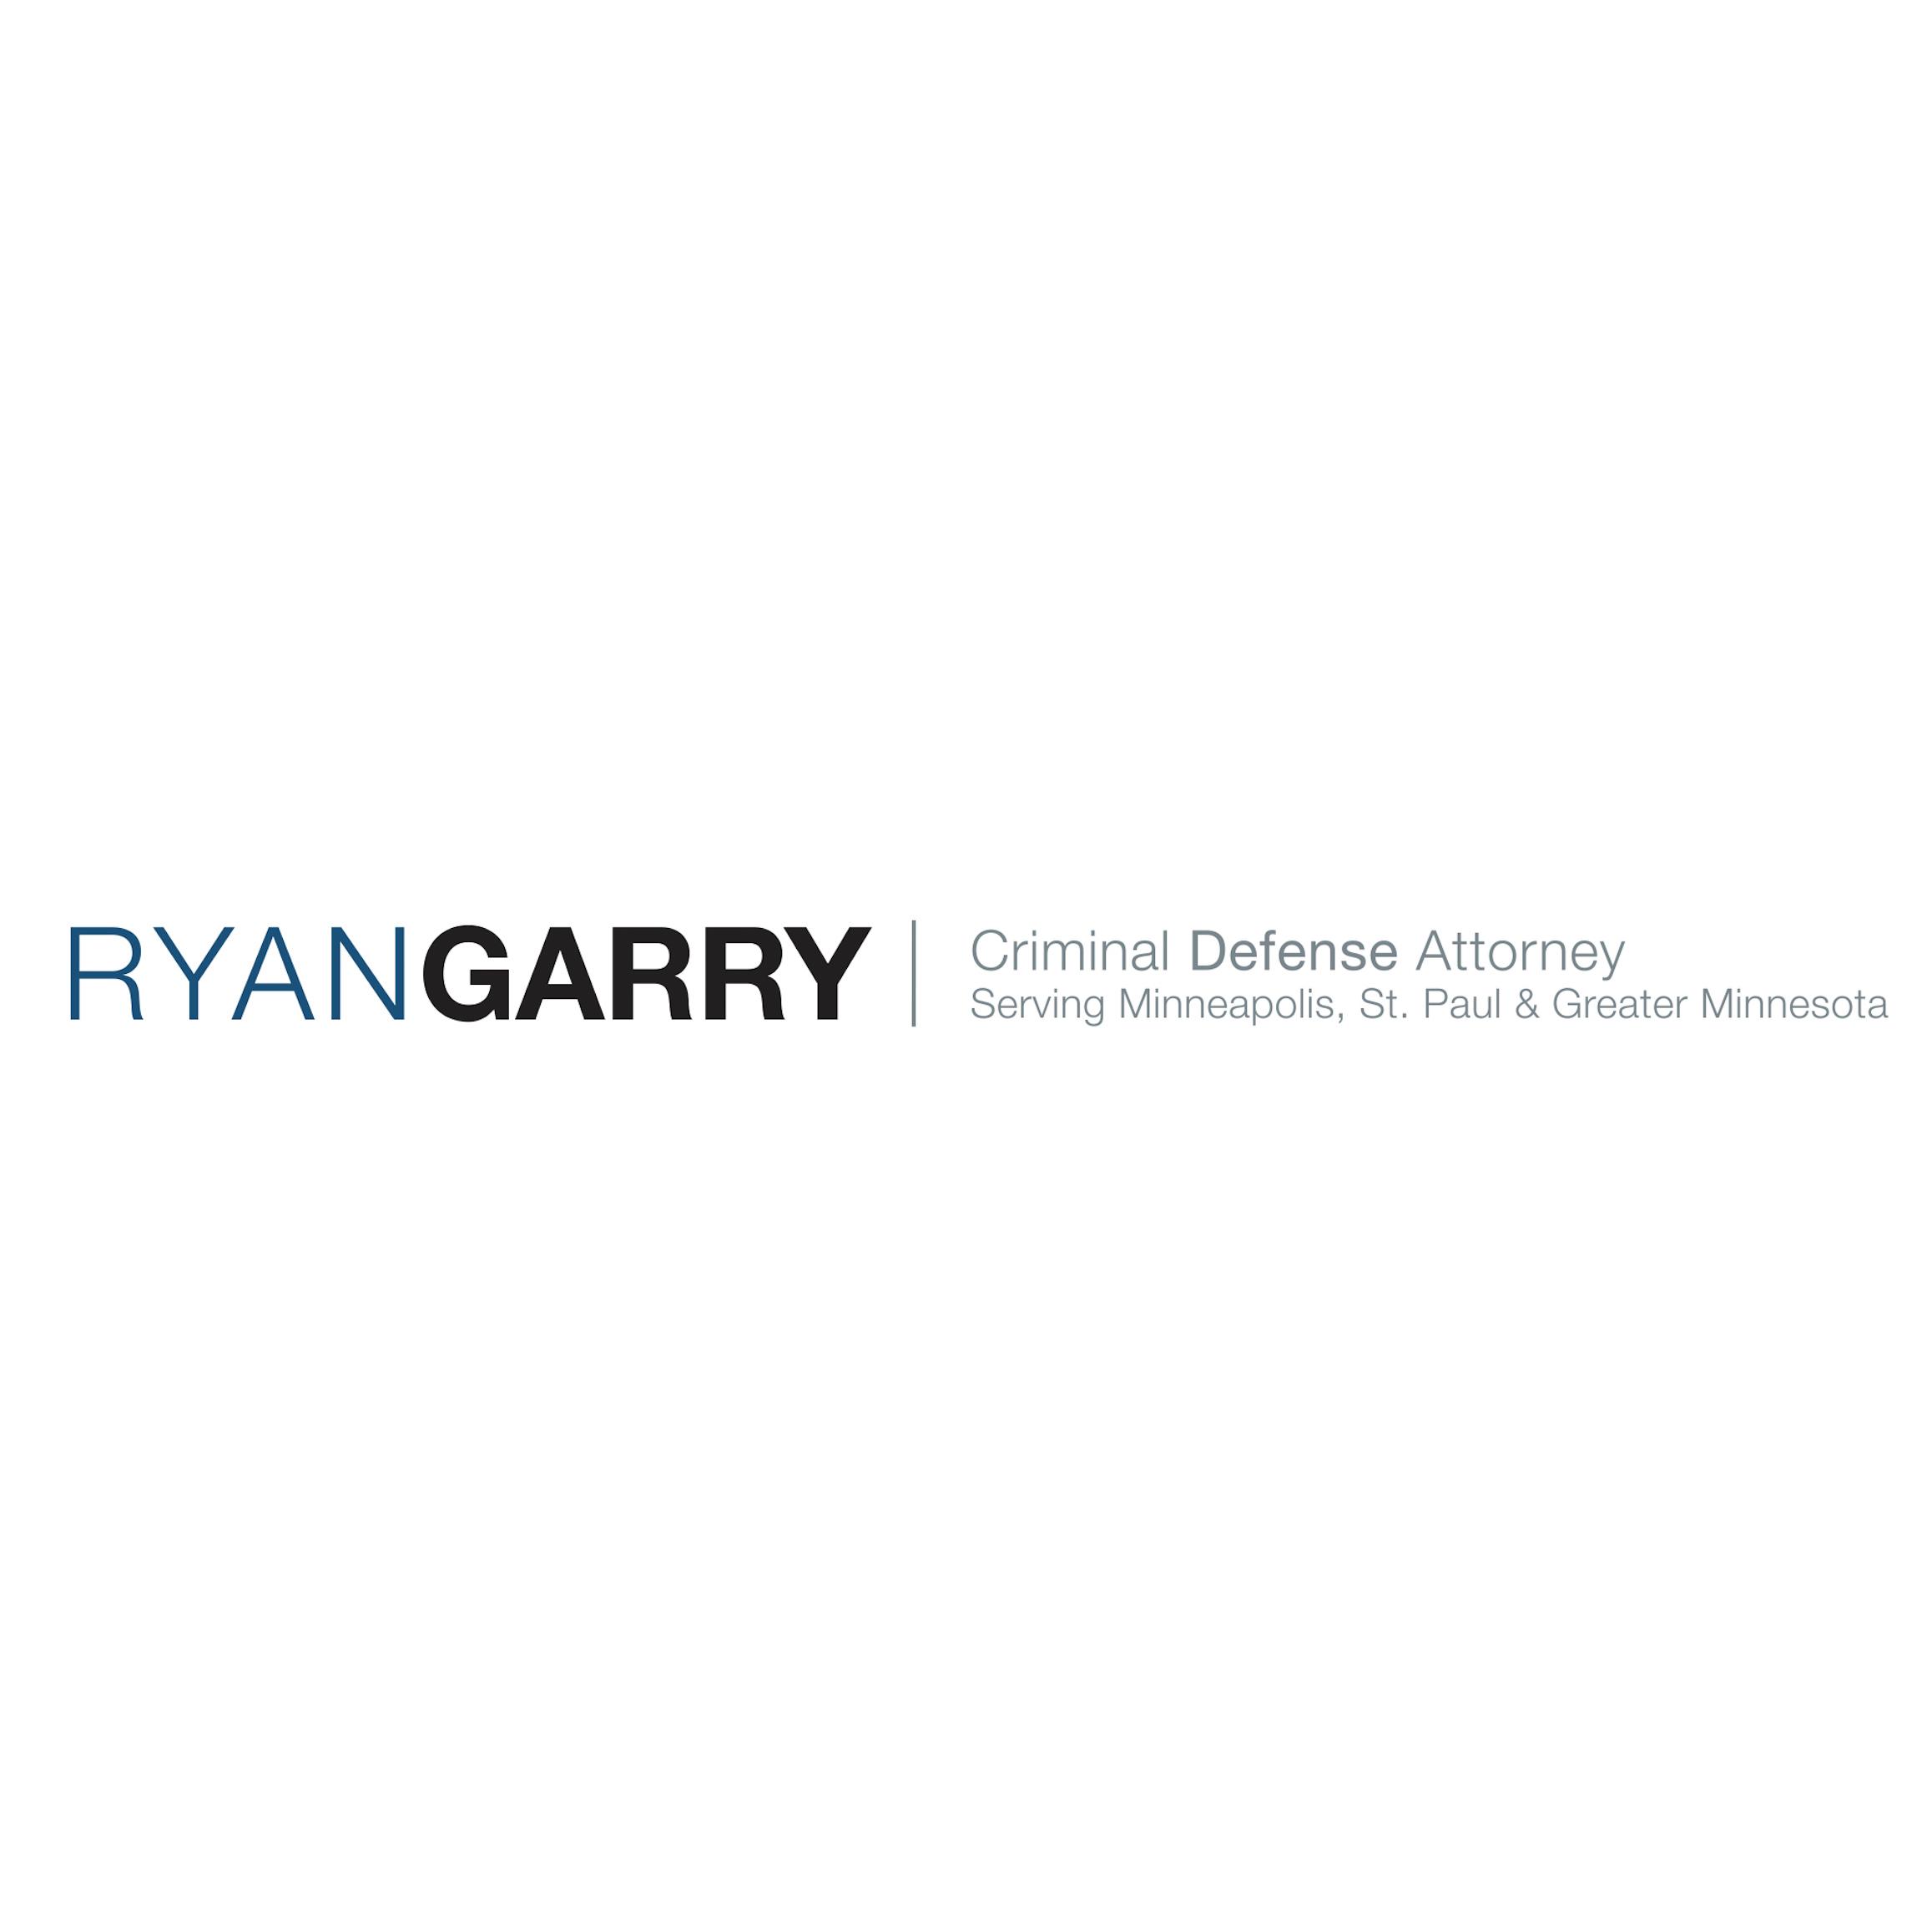 Ryan Garry, Minneapolis MN Criminal Defense Attorneys